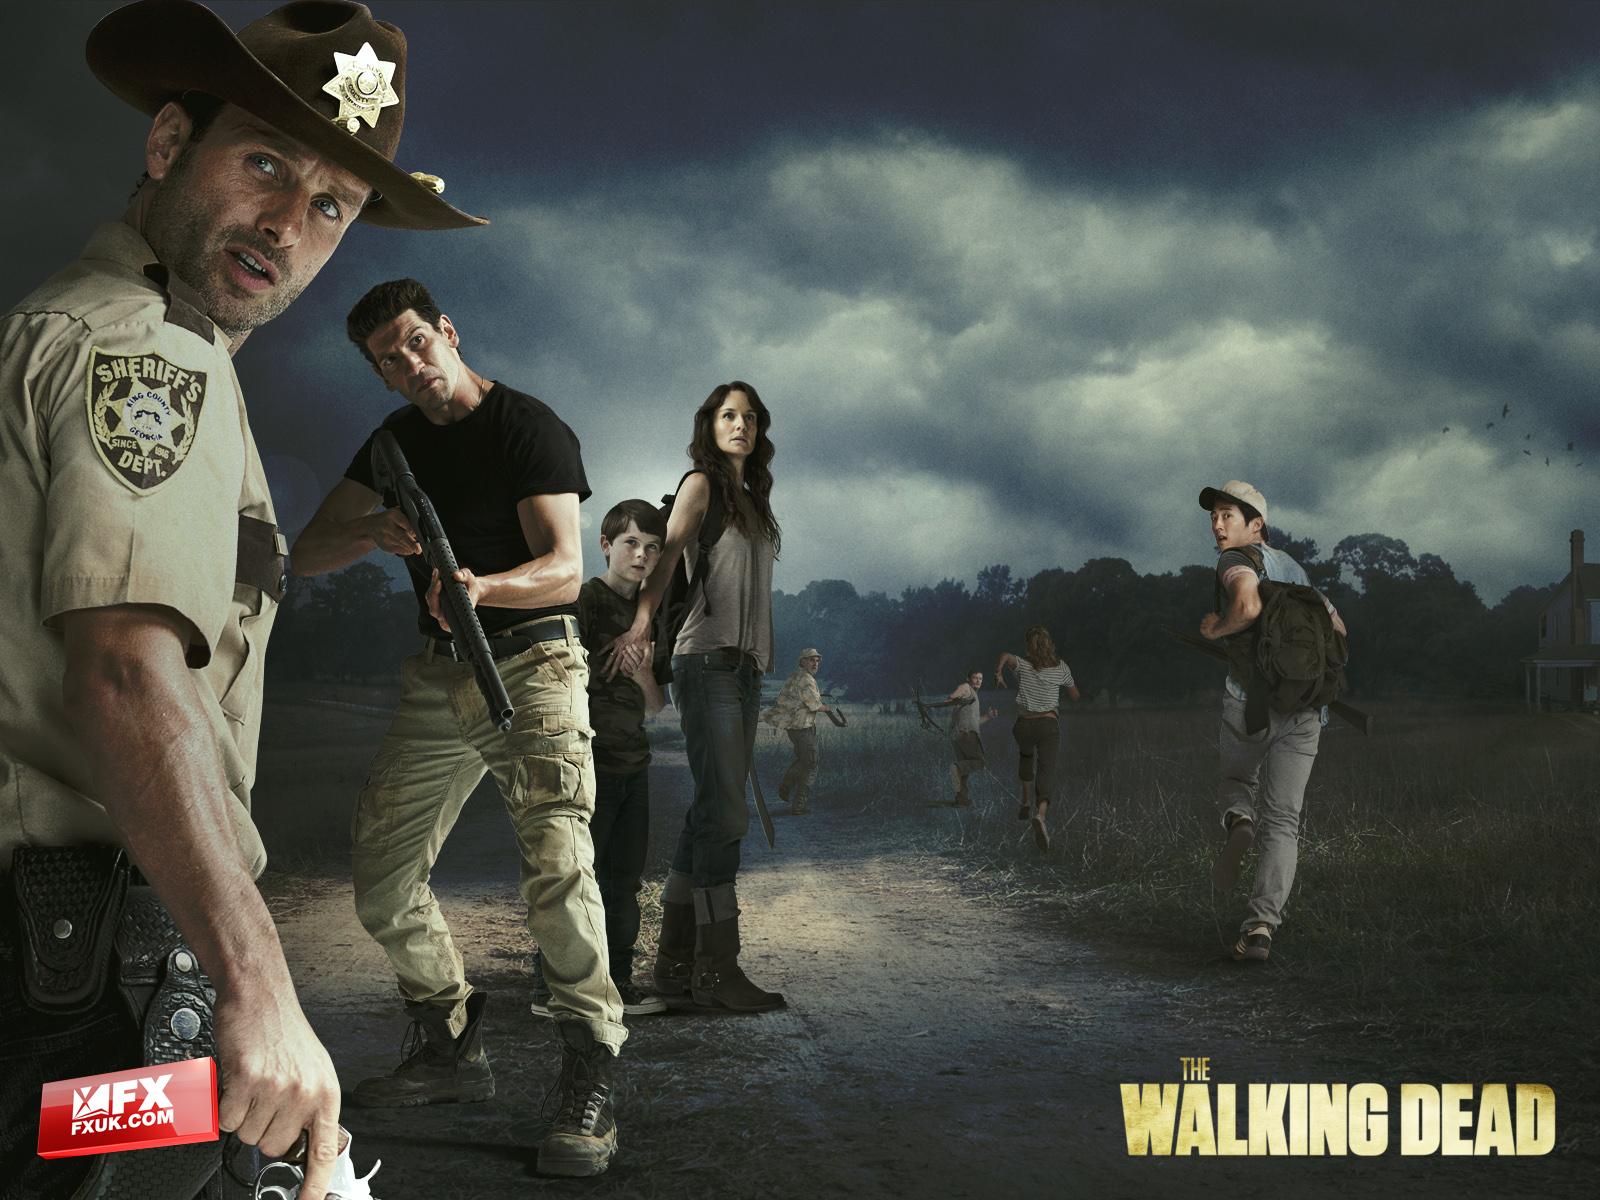 The Walking Dead Season 2 Wallpapers Video Game Hq The Walking